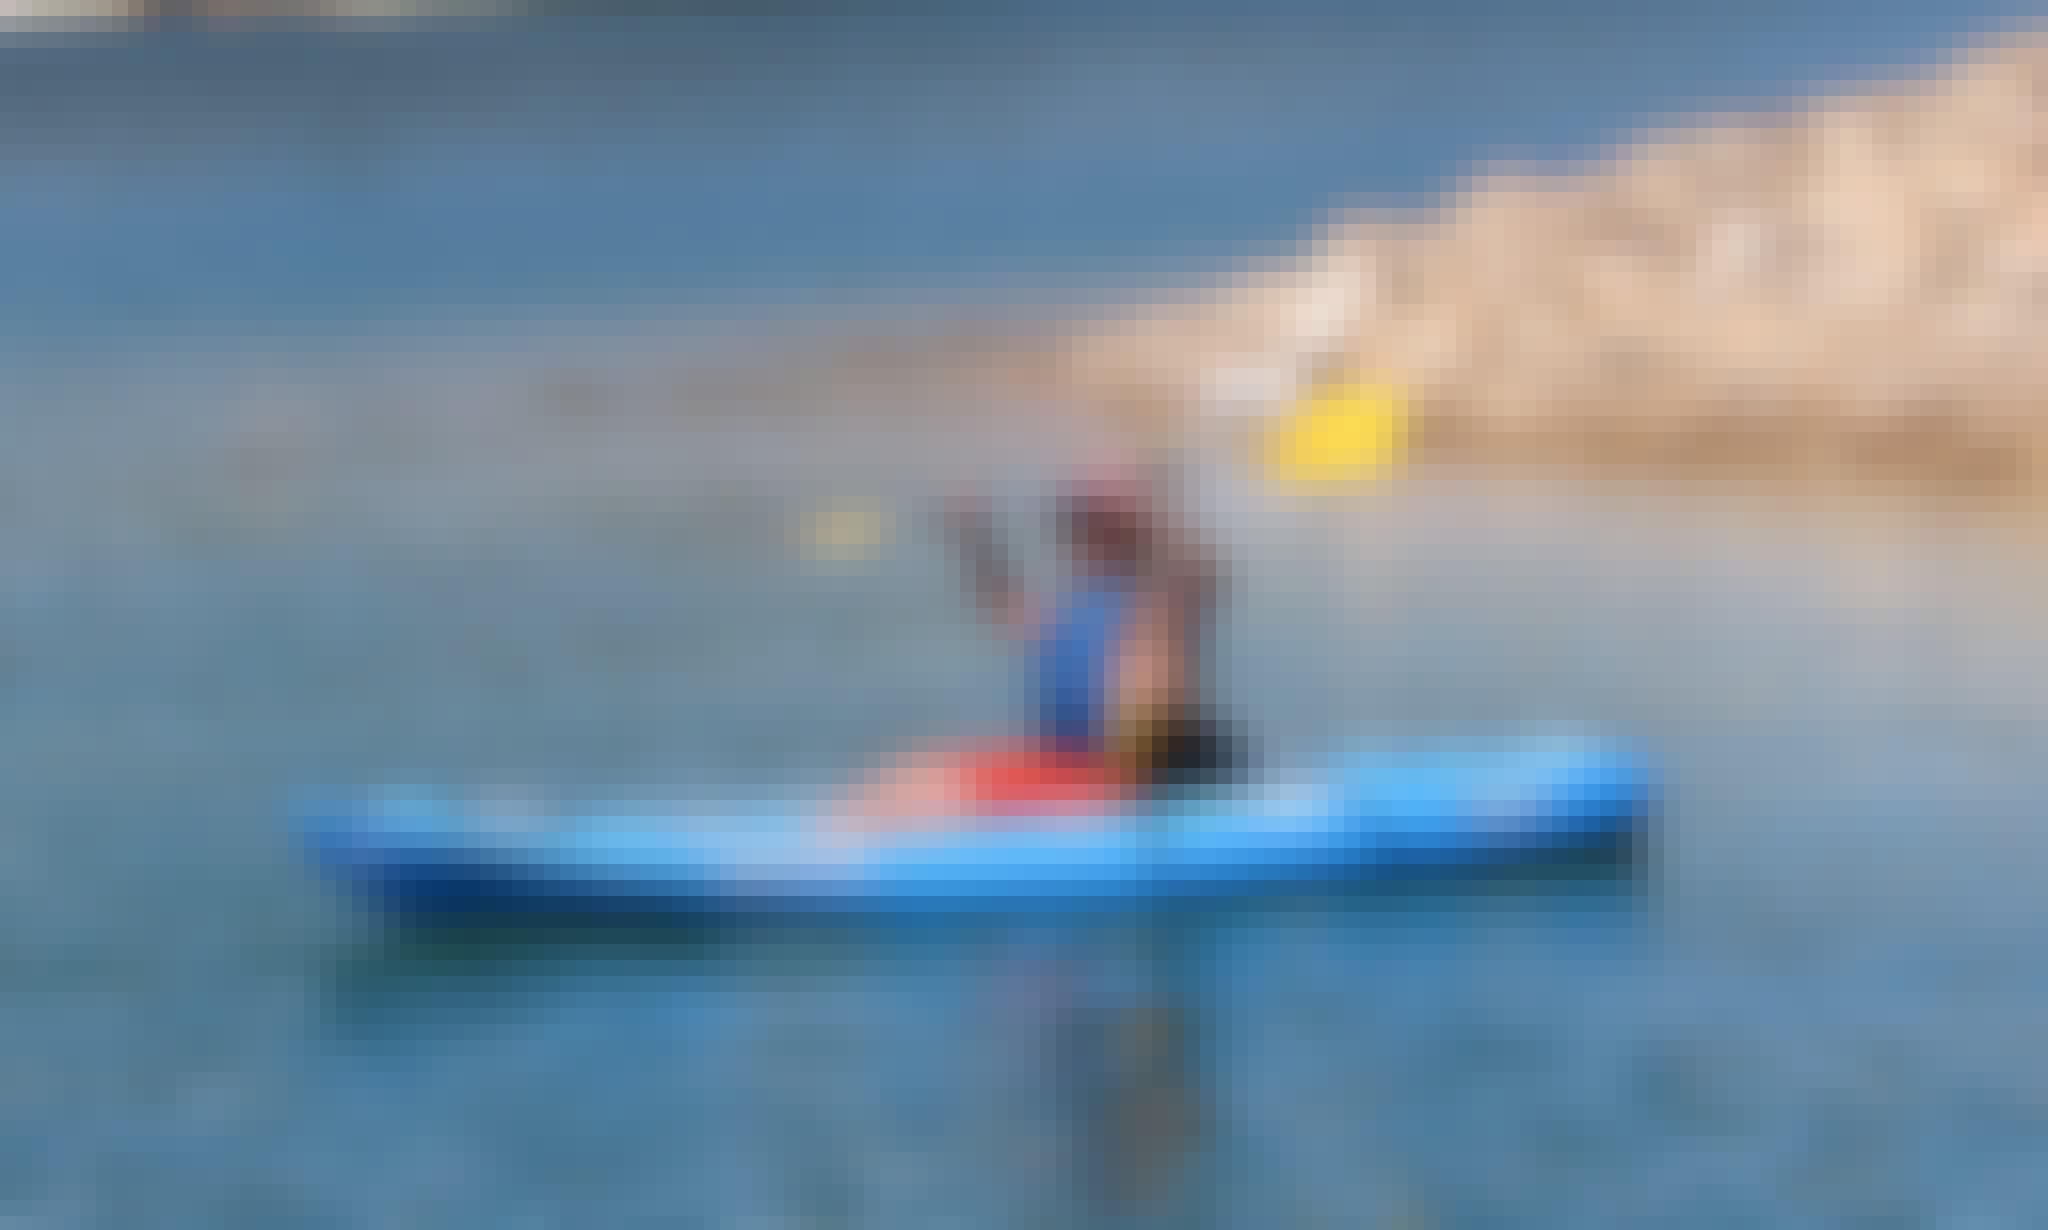 Single Kayak Tours in Barragem de Santa Clara, Portugal